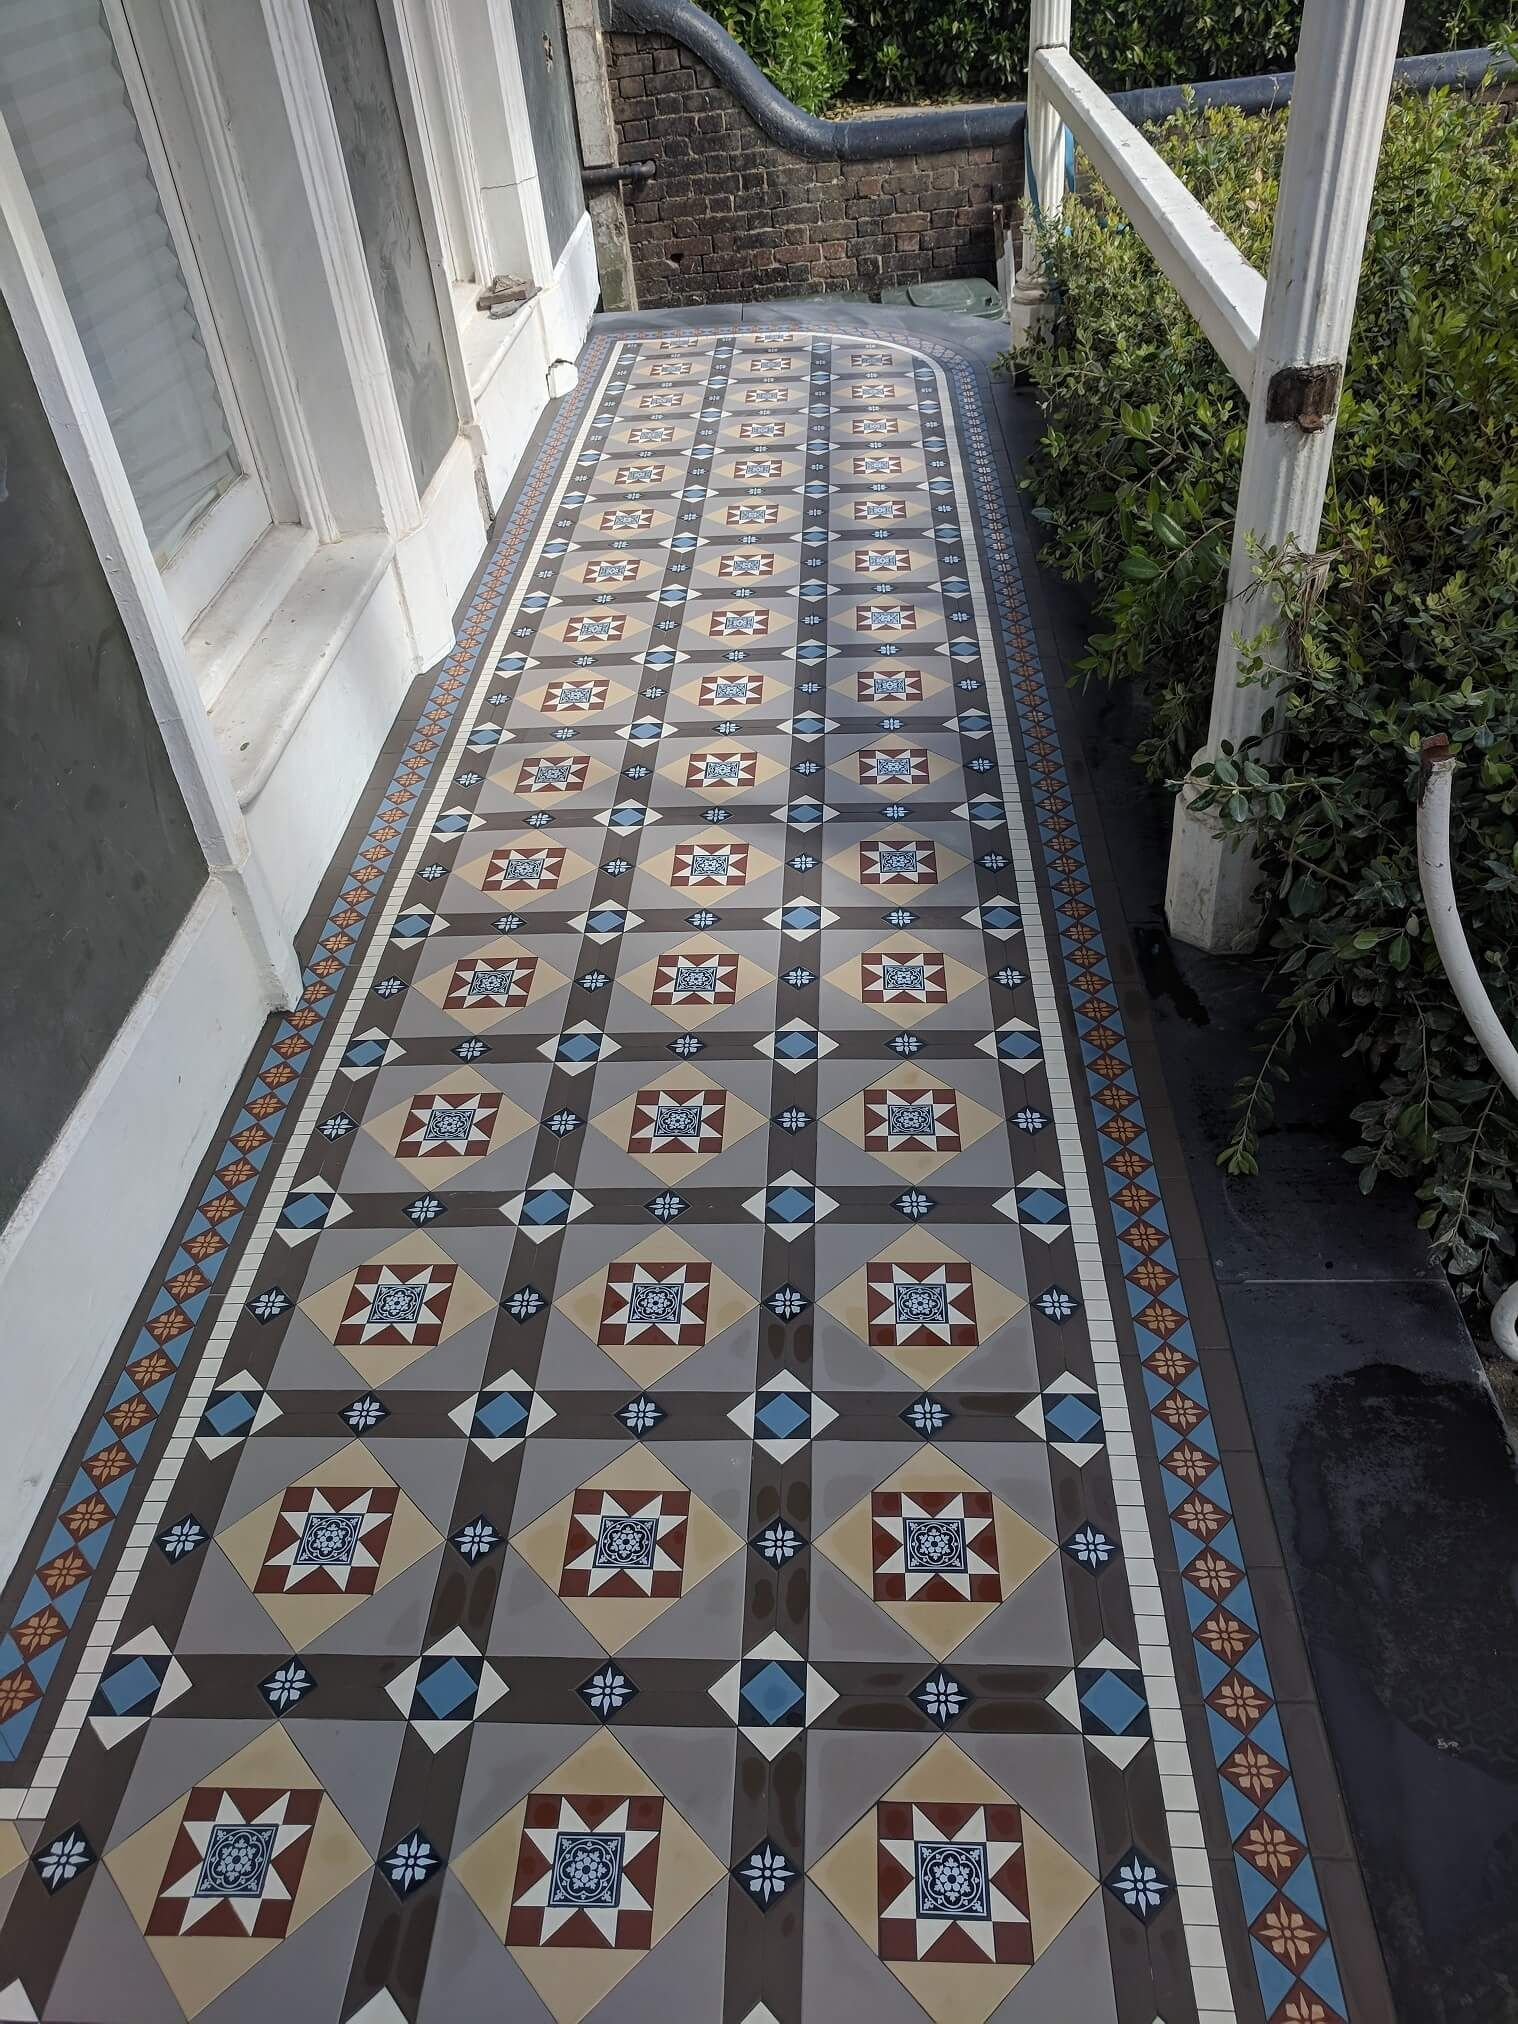 38+ Fantastic Terrific Tiles Images | Victorian mosaic ...